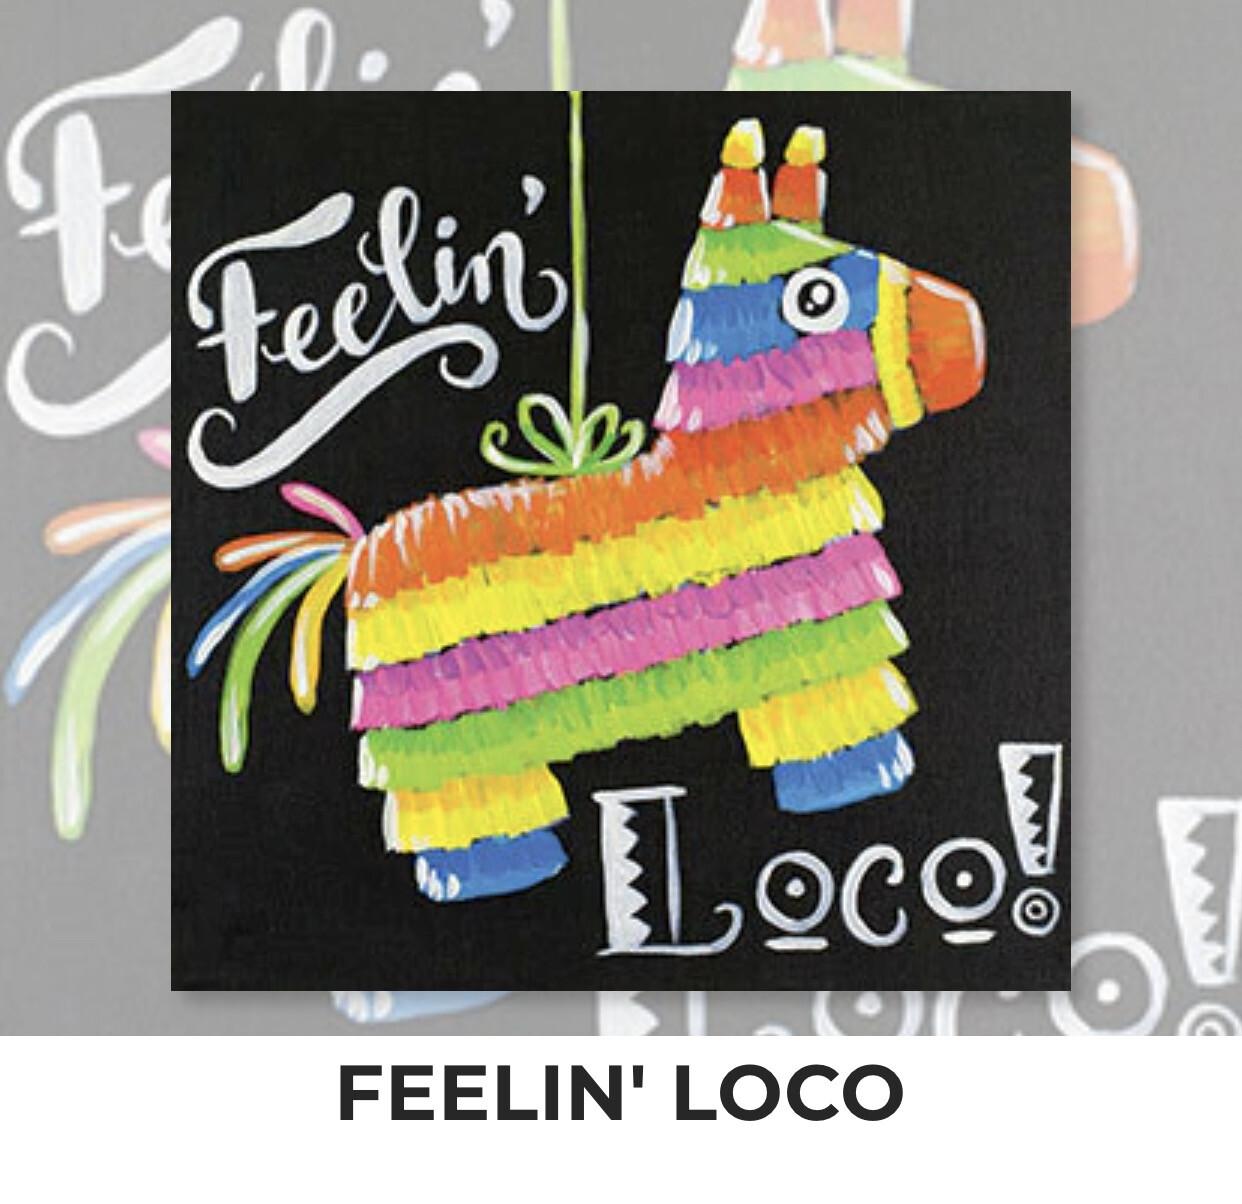 Feelin' Loco ADULT OR TWEEN Acrylic Paint On Canvas DIY Art Kit - 3 Week Special Order